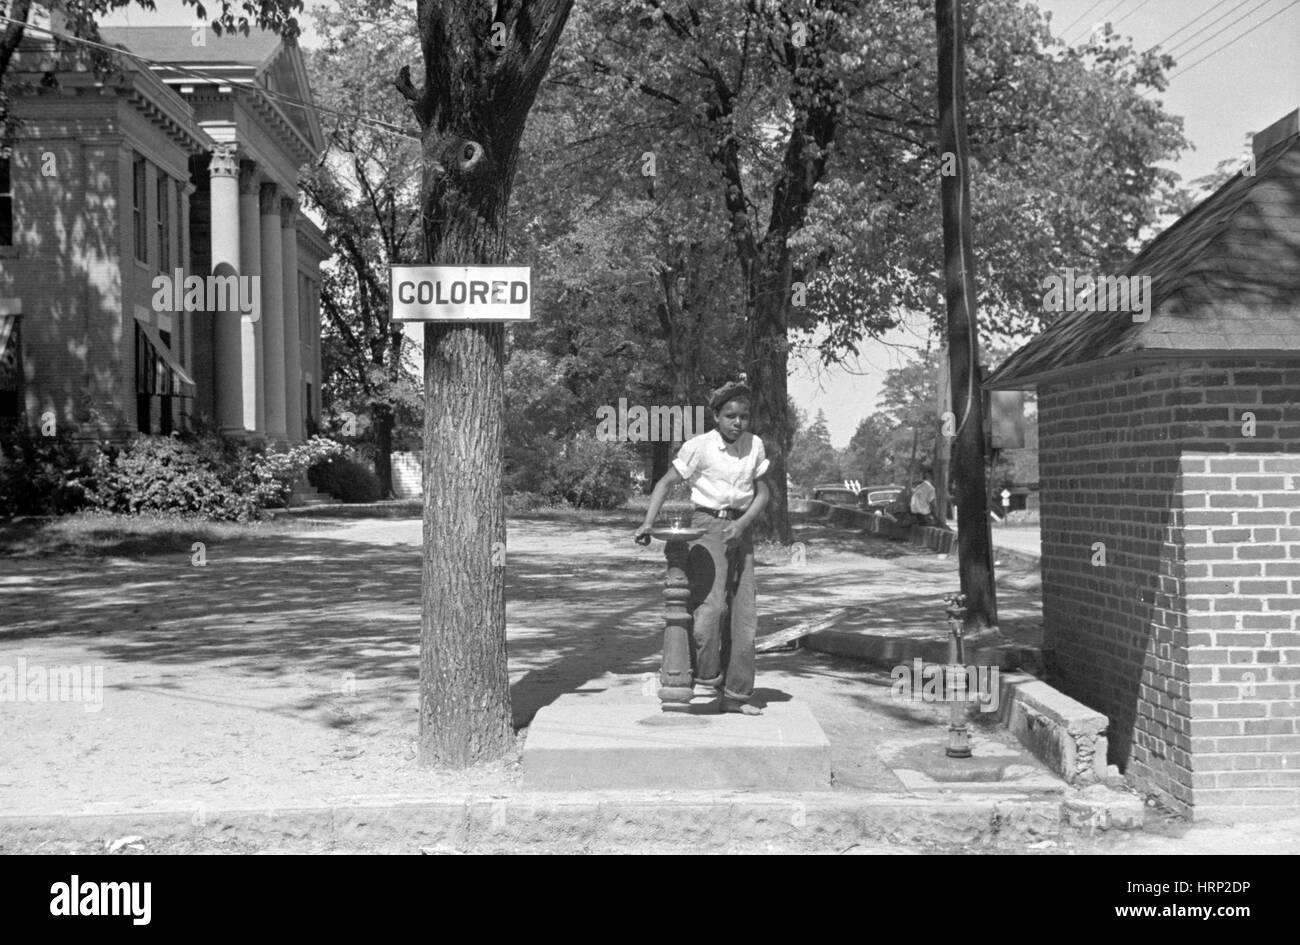 Segregated Water Fountain, 1938 - Stock Image